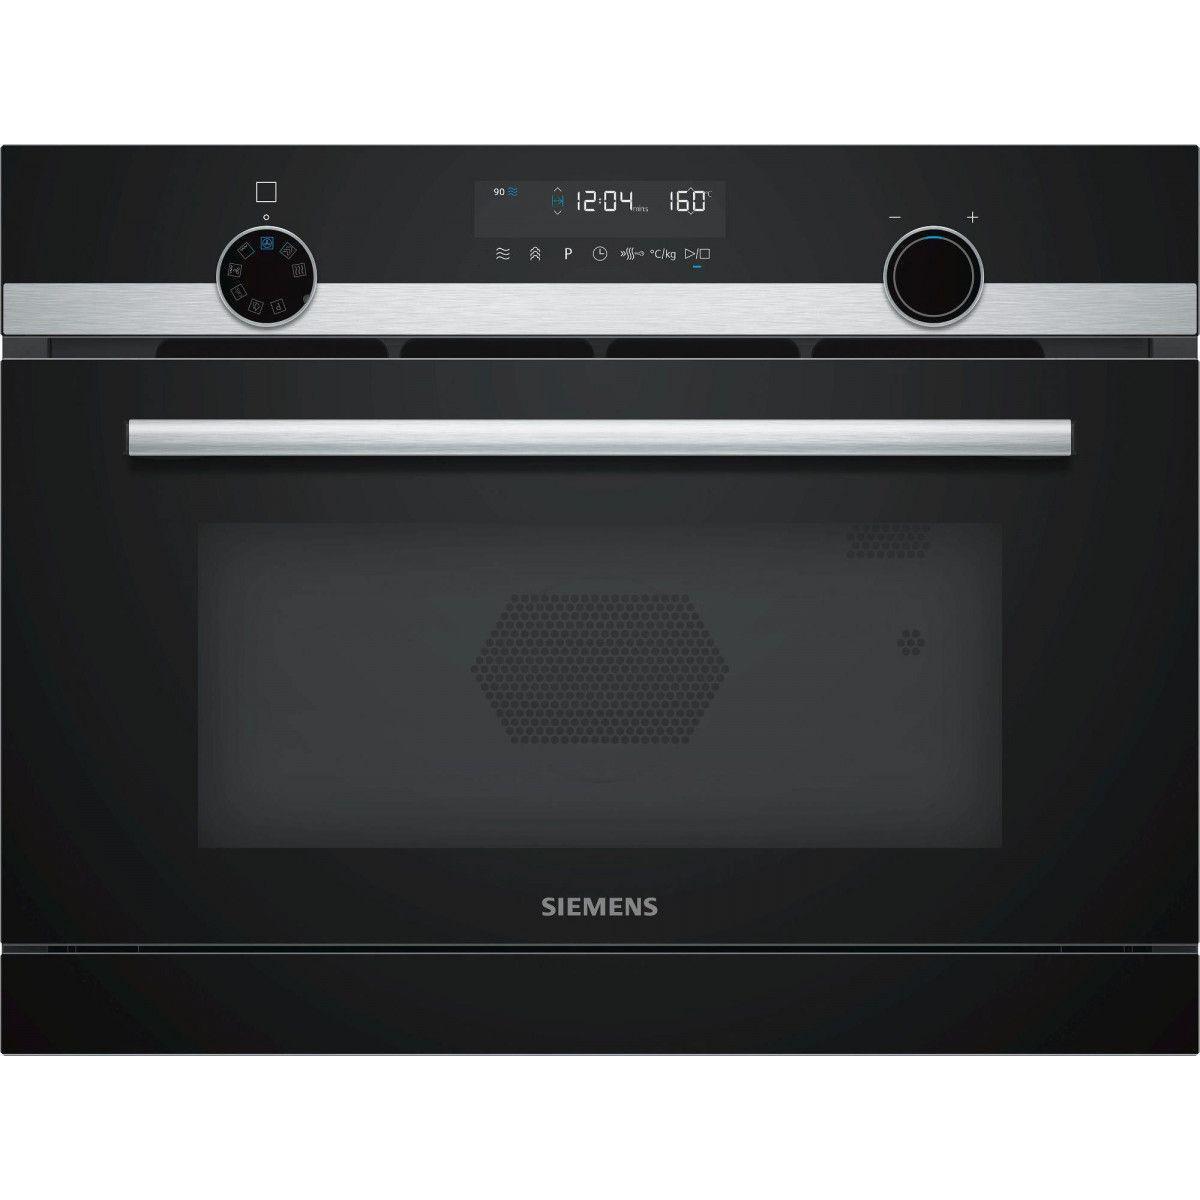 Siemens Micro-ondes Encastrable 36l Siemens 1000w 56cm, Cp 565 Ags 0